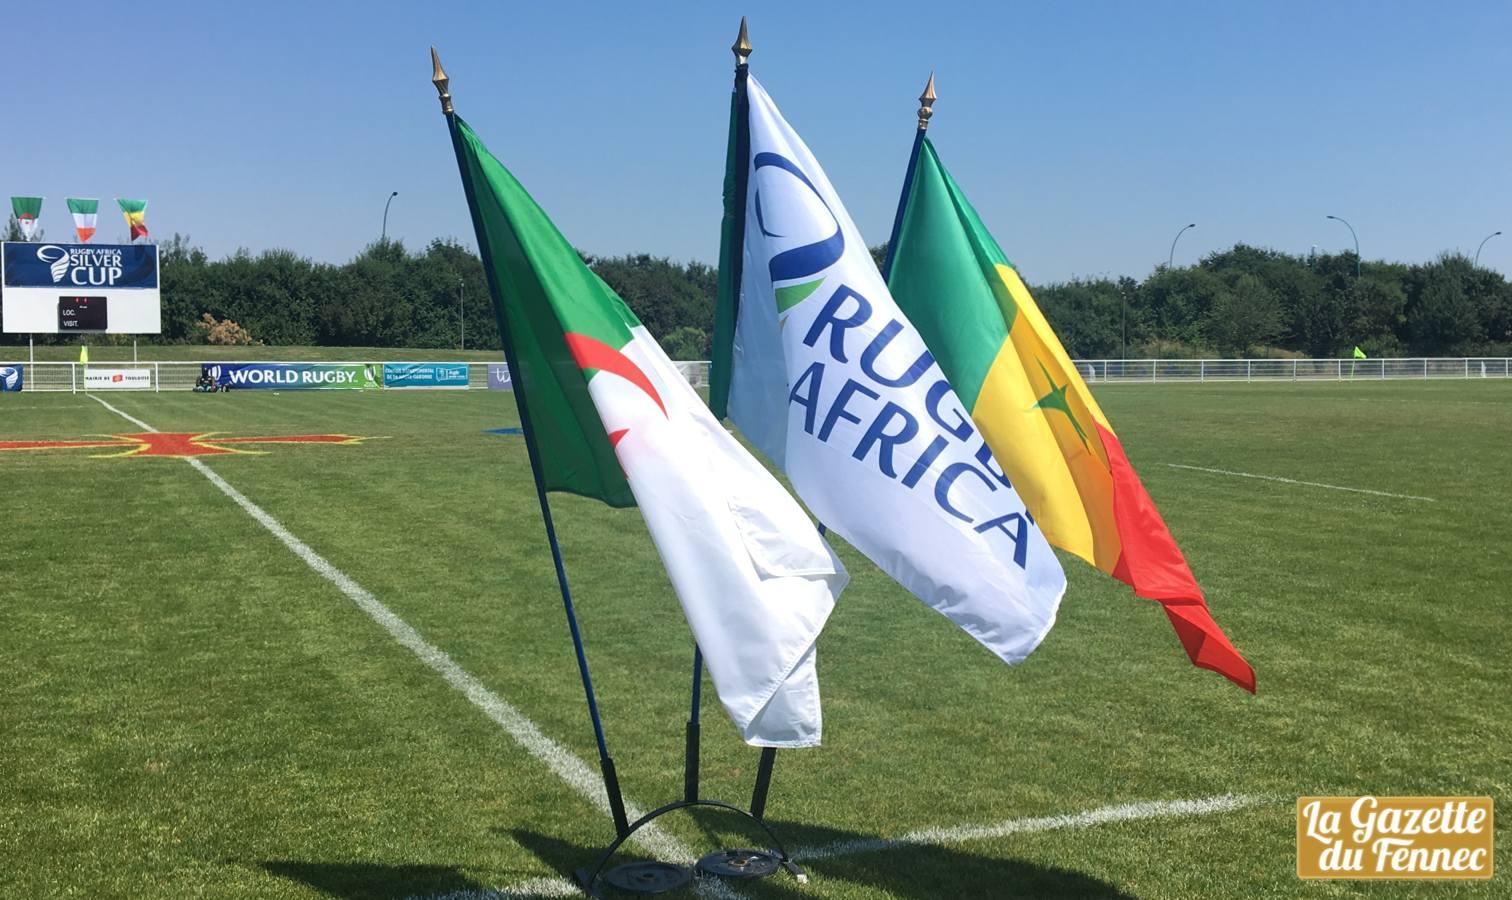 drapeaux silver cup algerie rugby toulouse